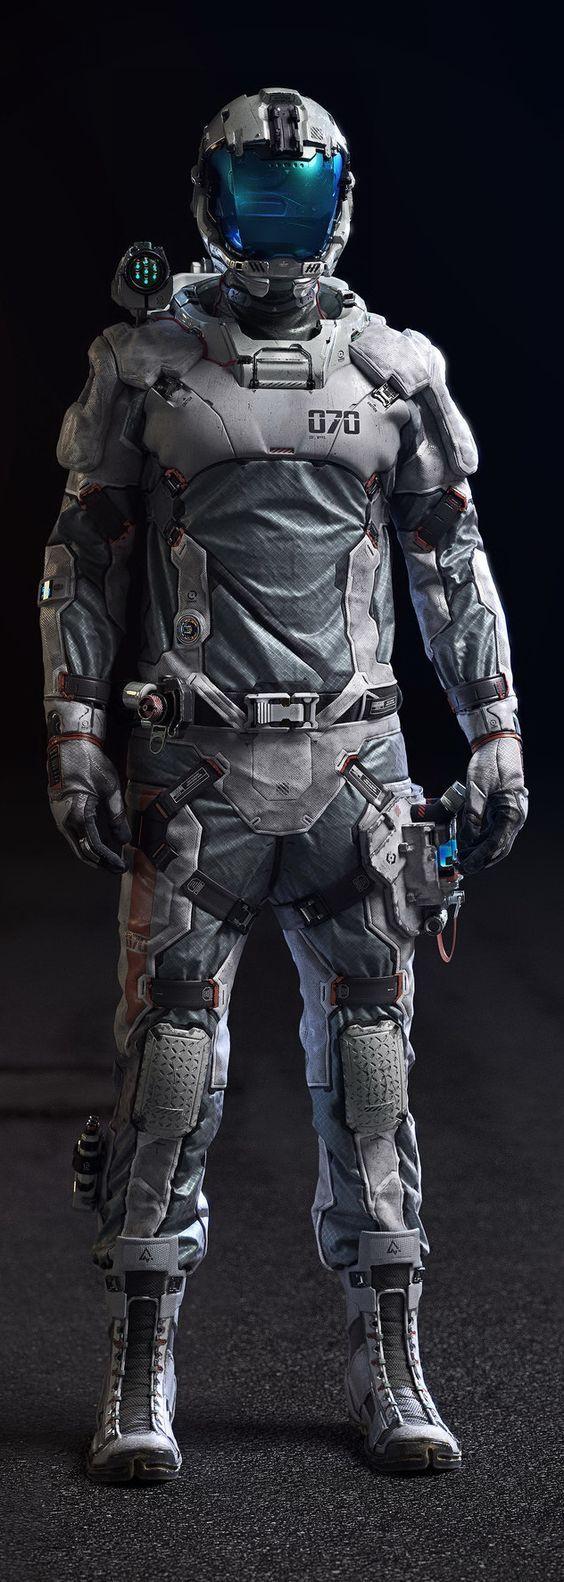 Mark II Advanced Boundary Corp. Battle Suit